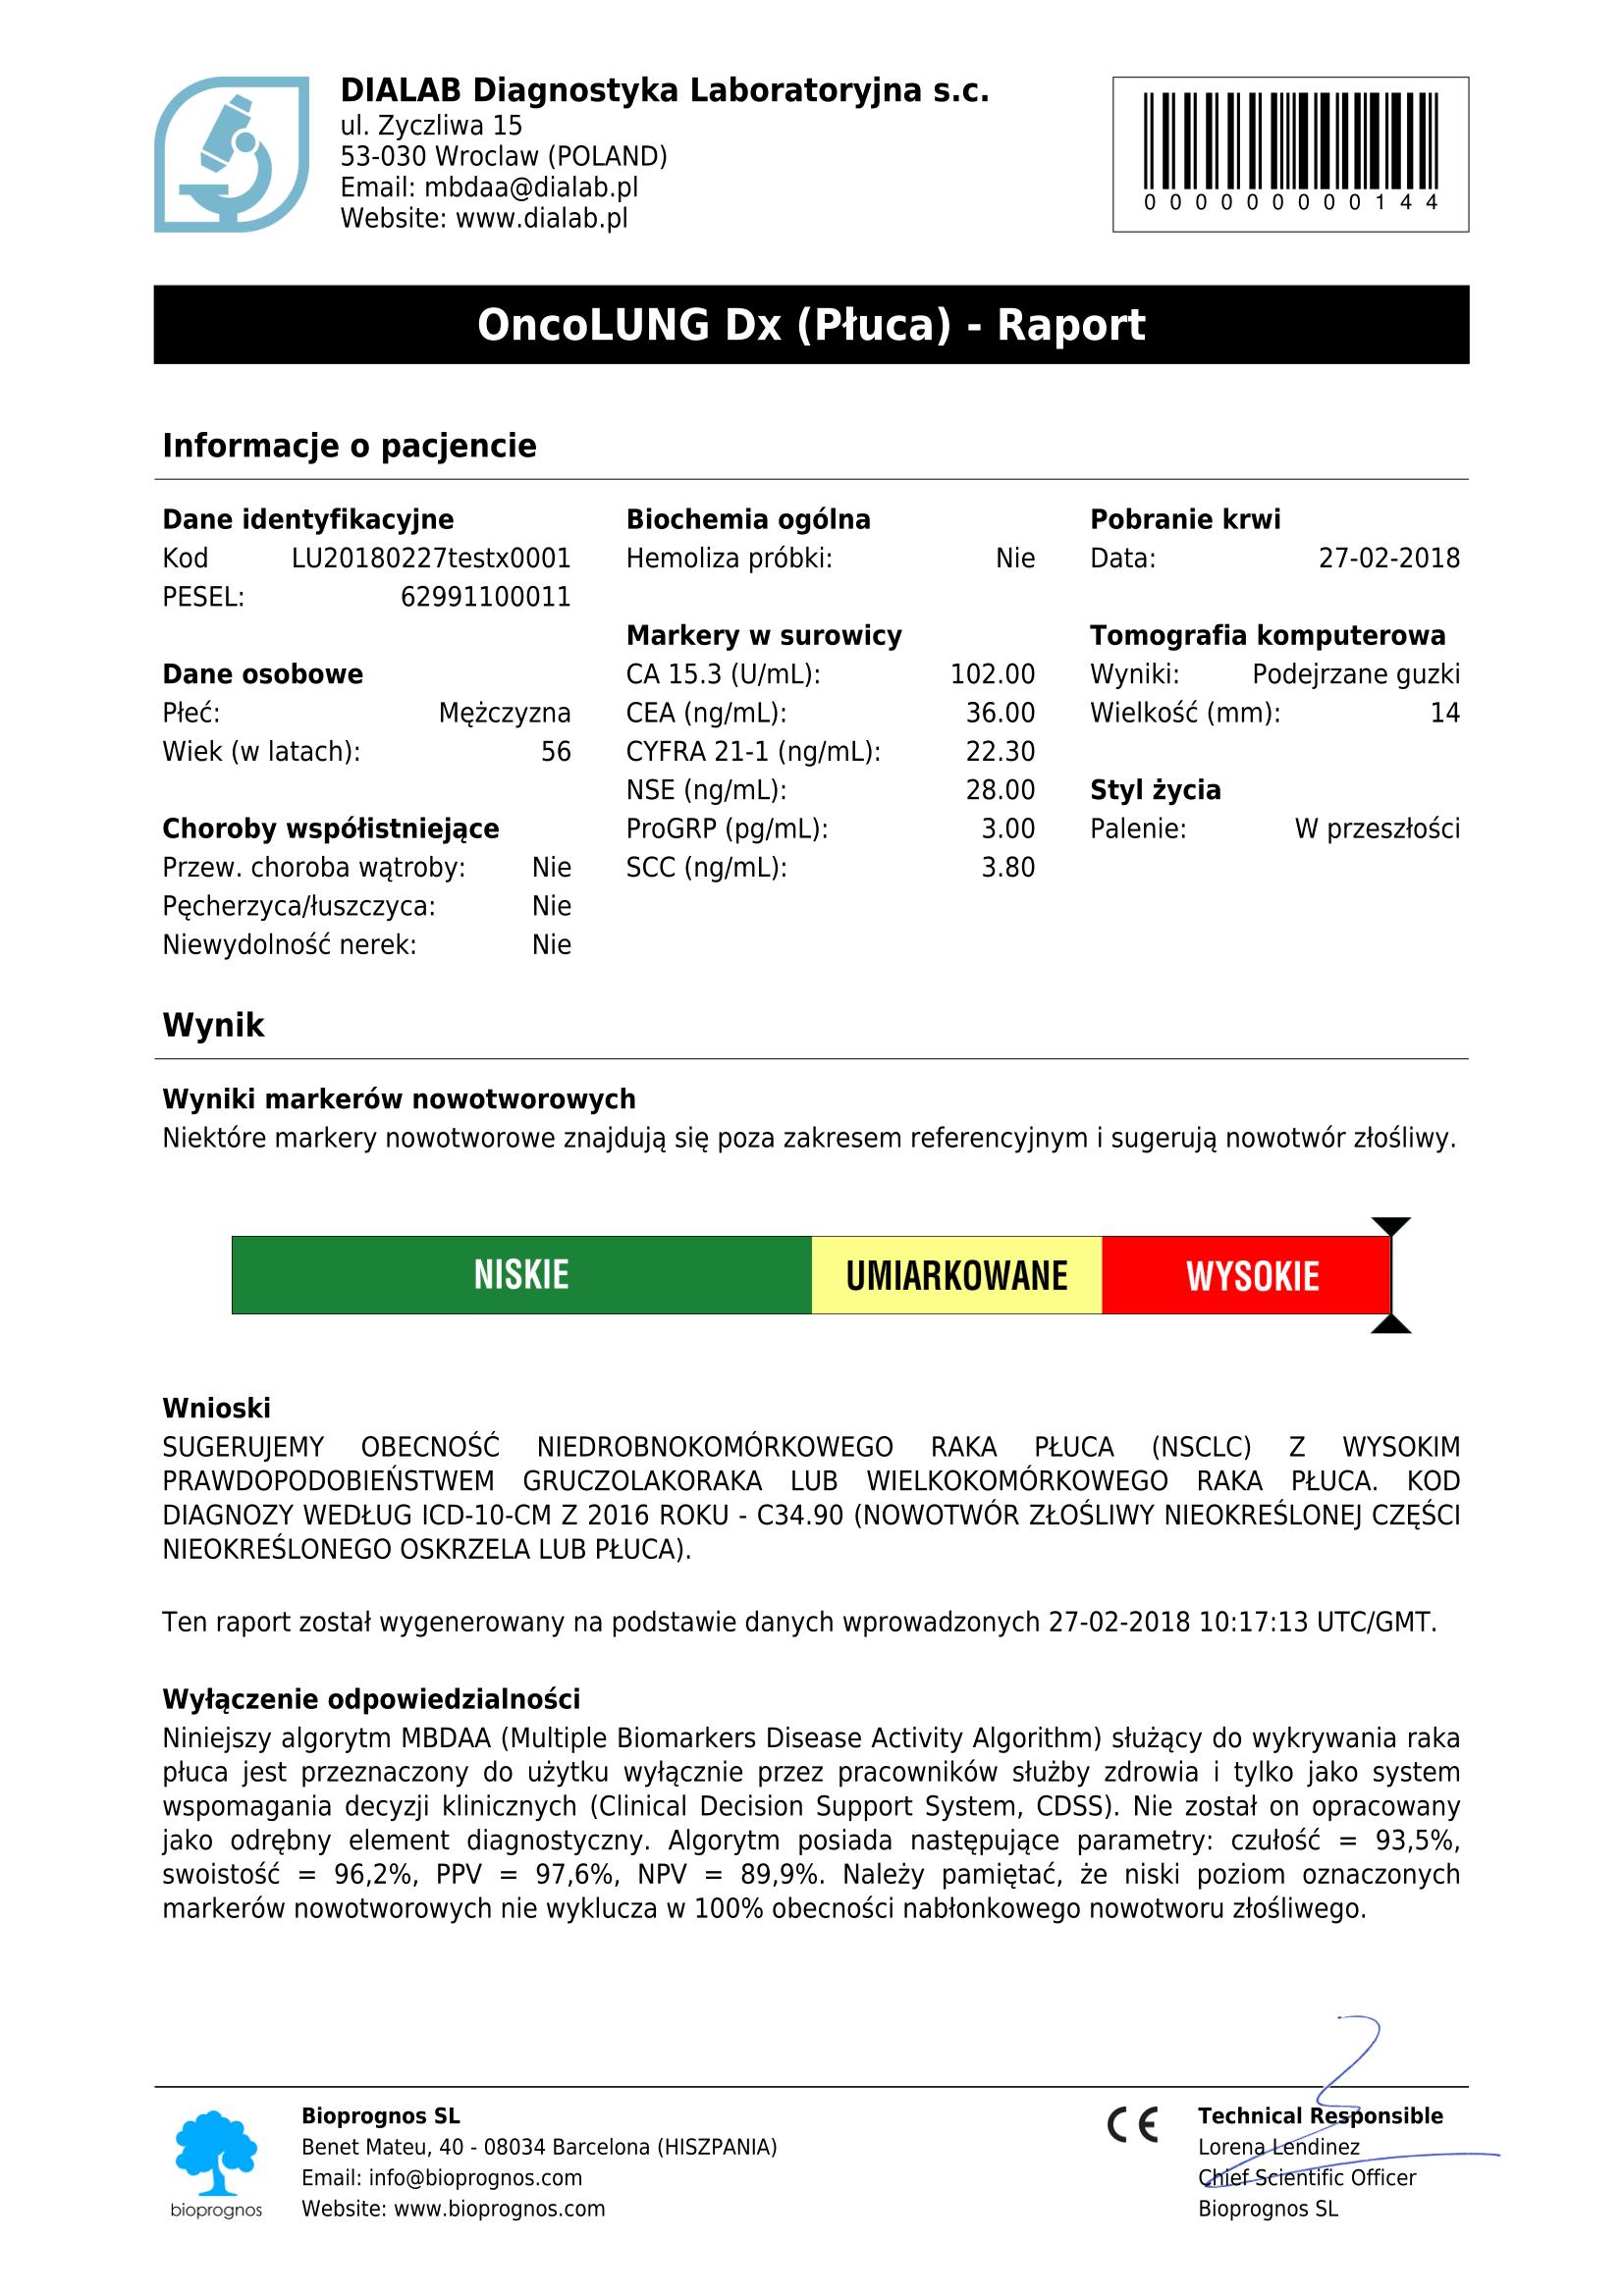 OncoLUNG-Dx-Raport,Bioprognos IMS